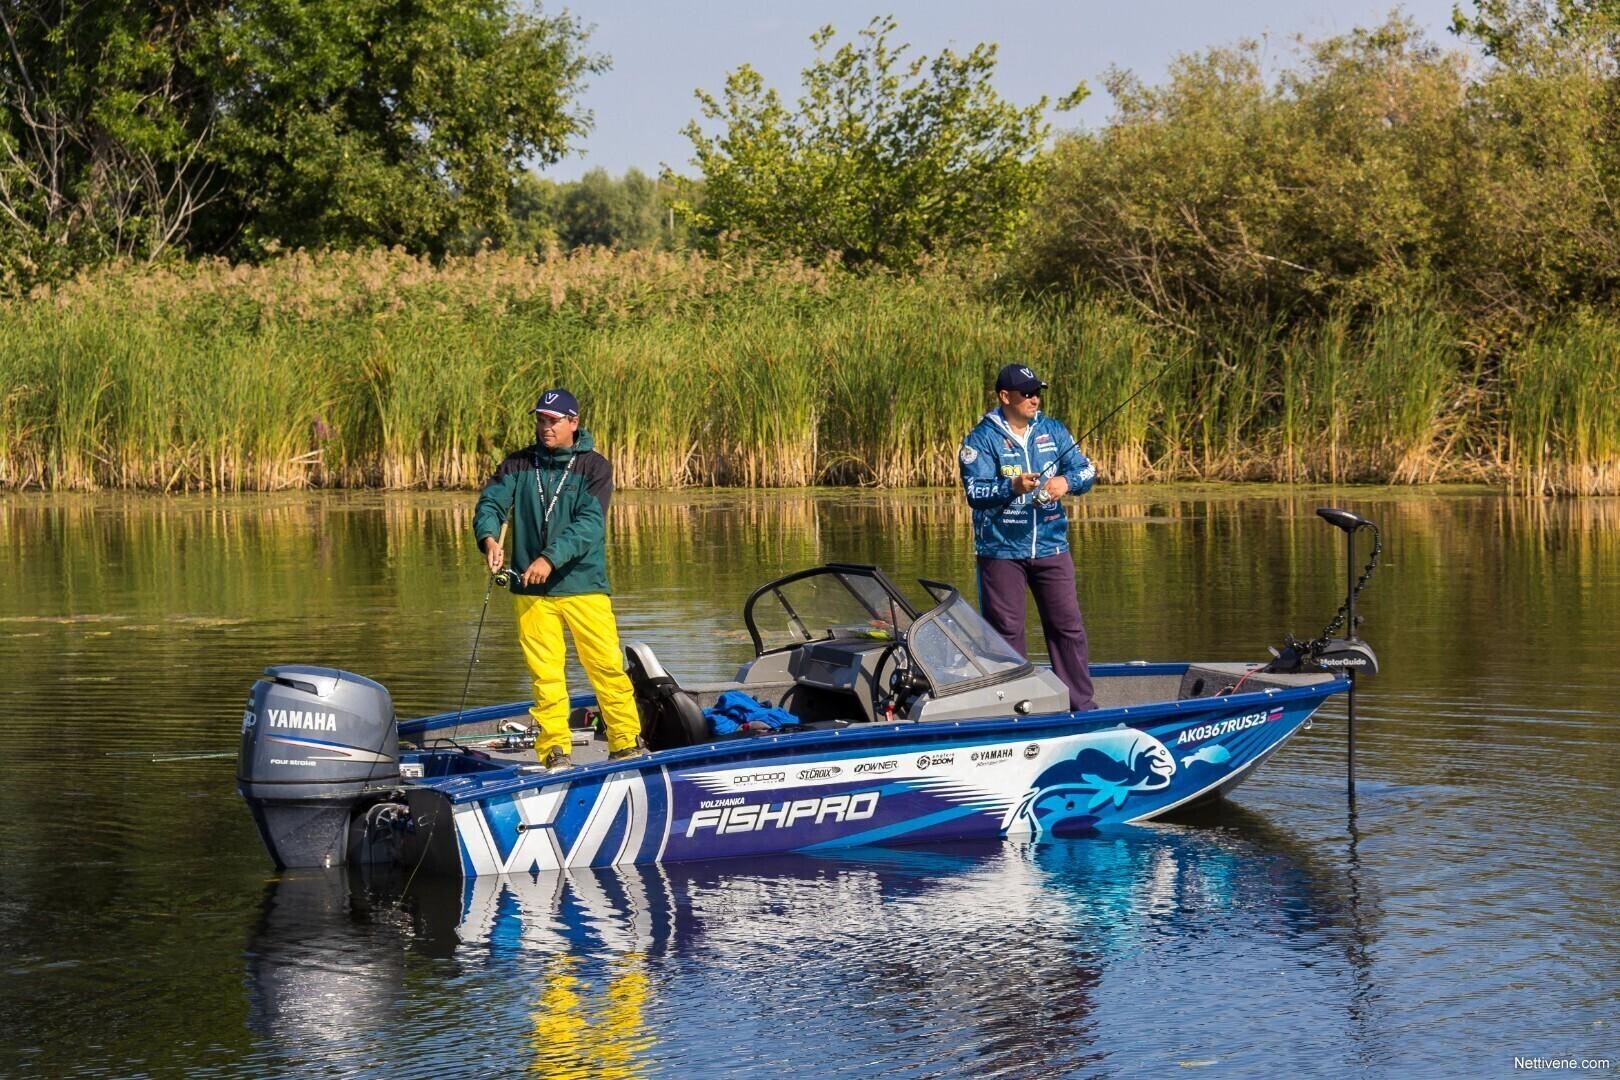 Fish Pro 50 + F115